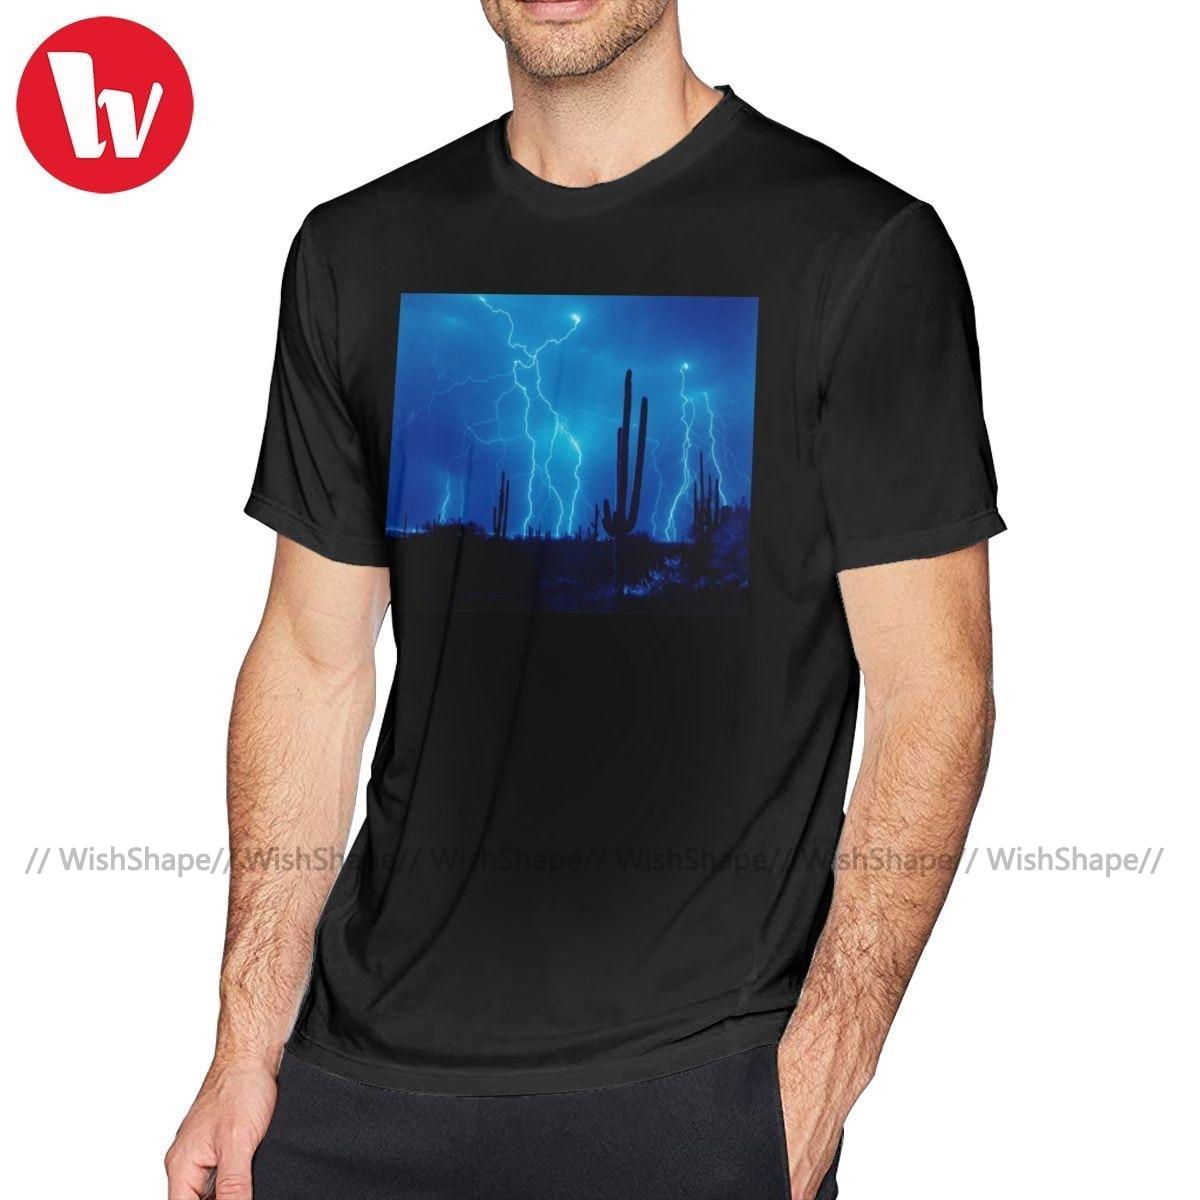 Troye Sivan T Shirt Travis Scott Rodeo Shirt T-Shirt Funny 100 Cotton Tee Shirt Fashion Big Graphic Men Tshirt